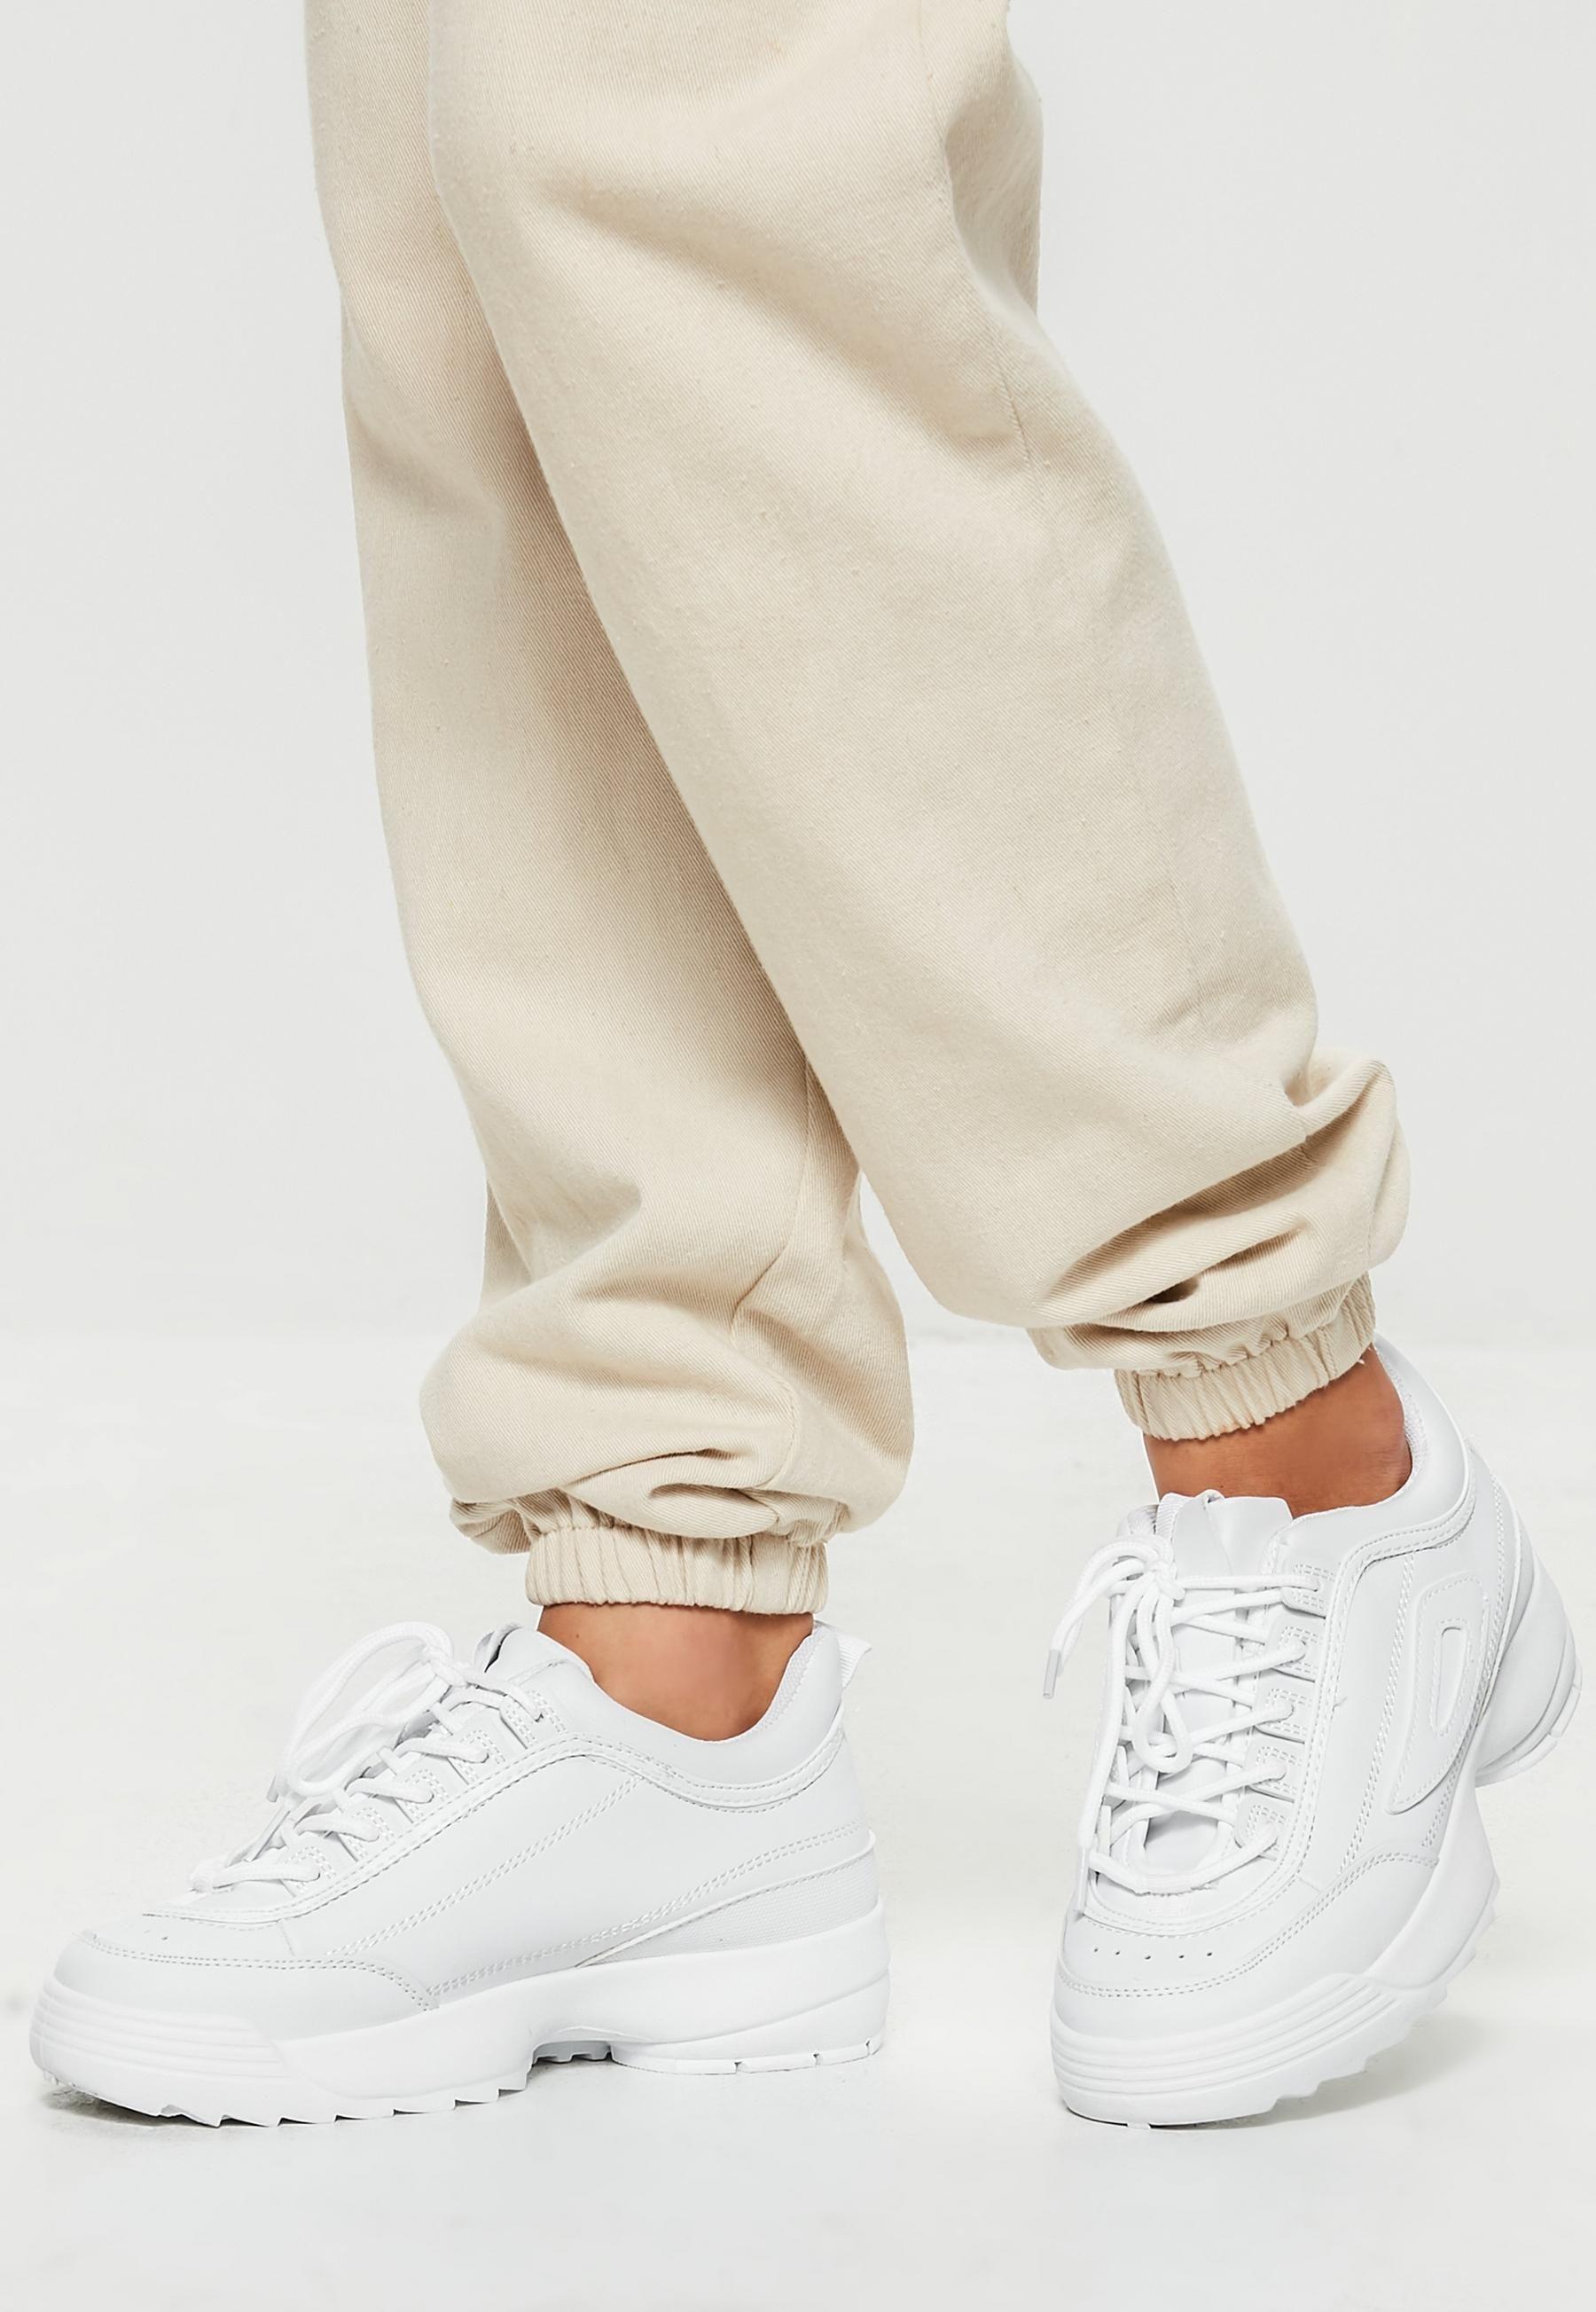 chuncky sneakers tendencia